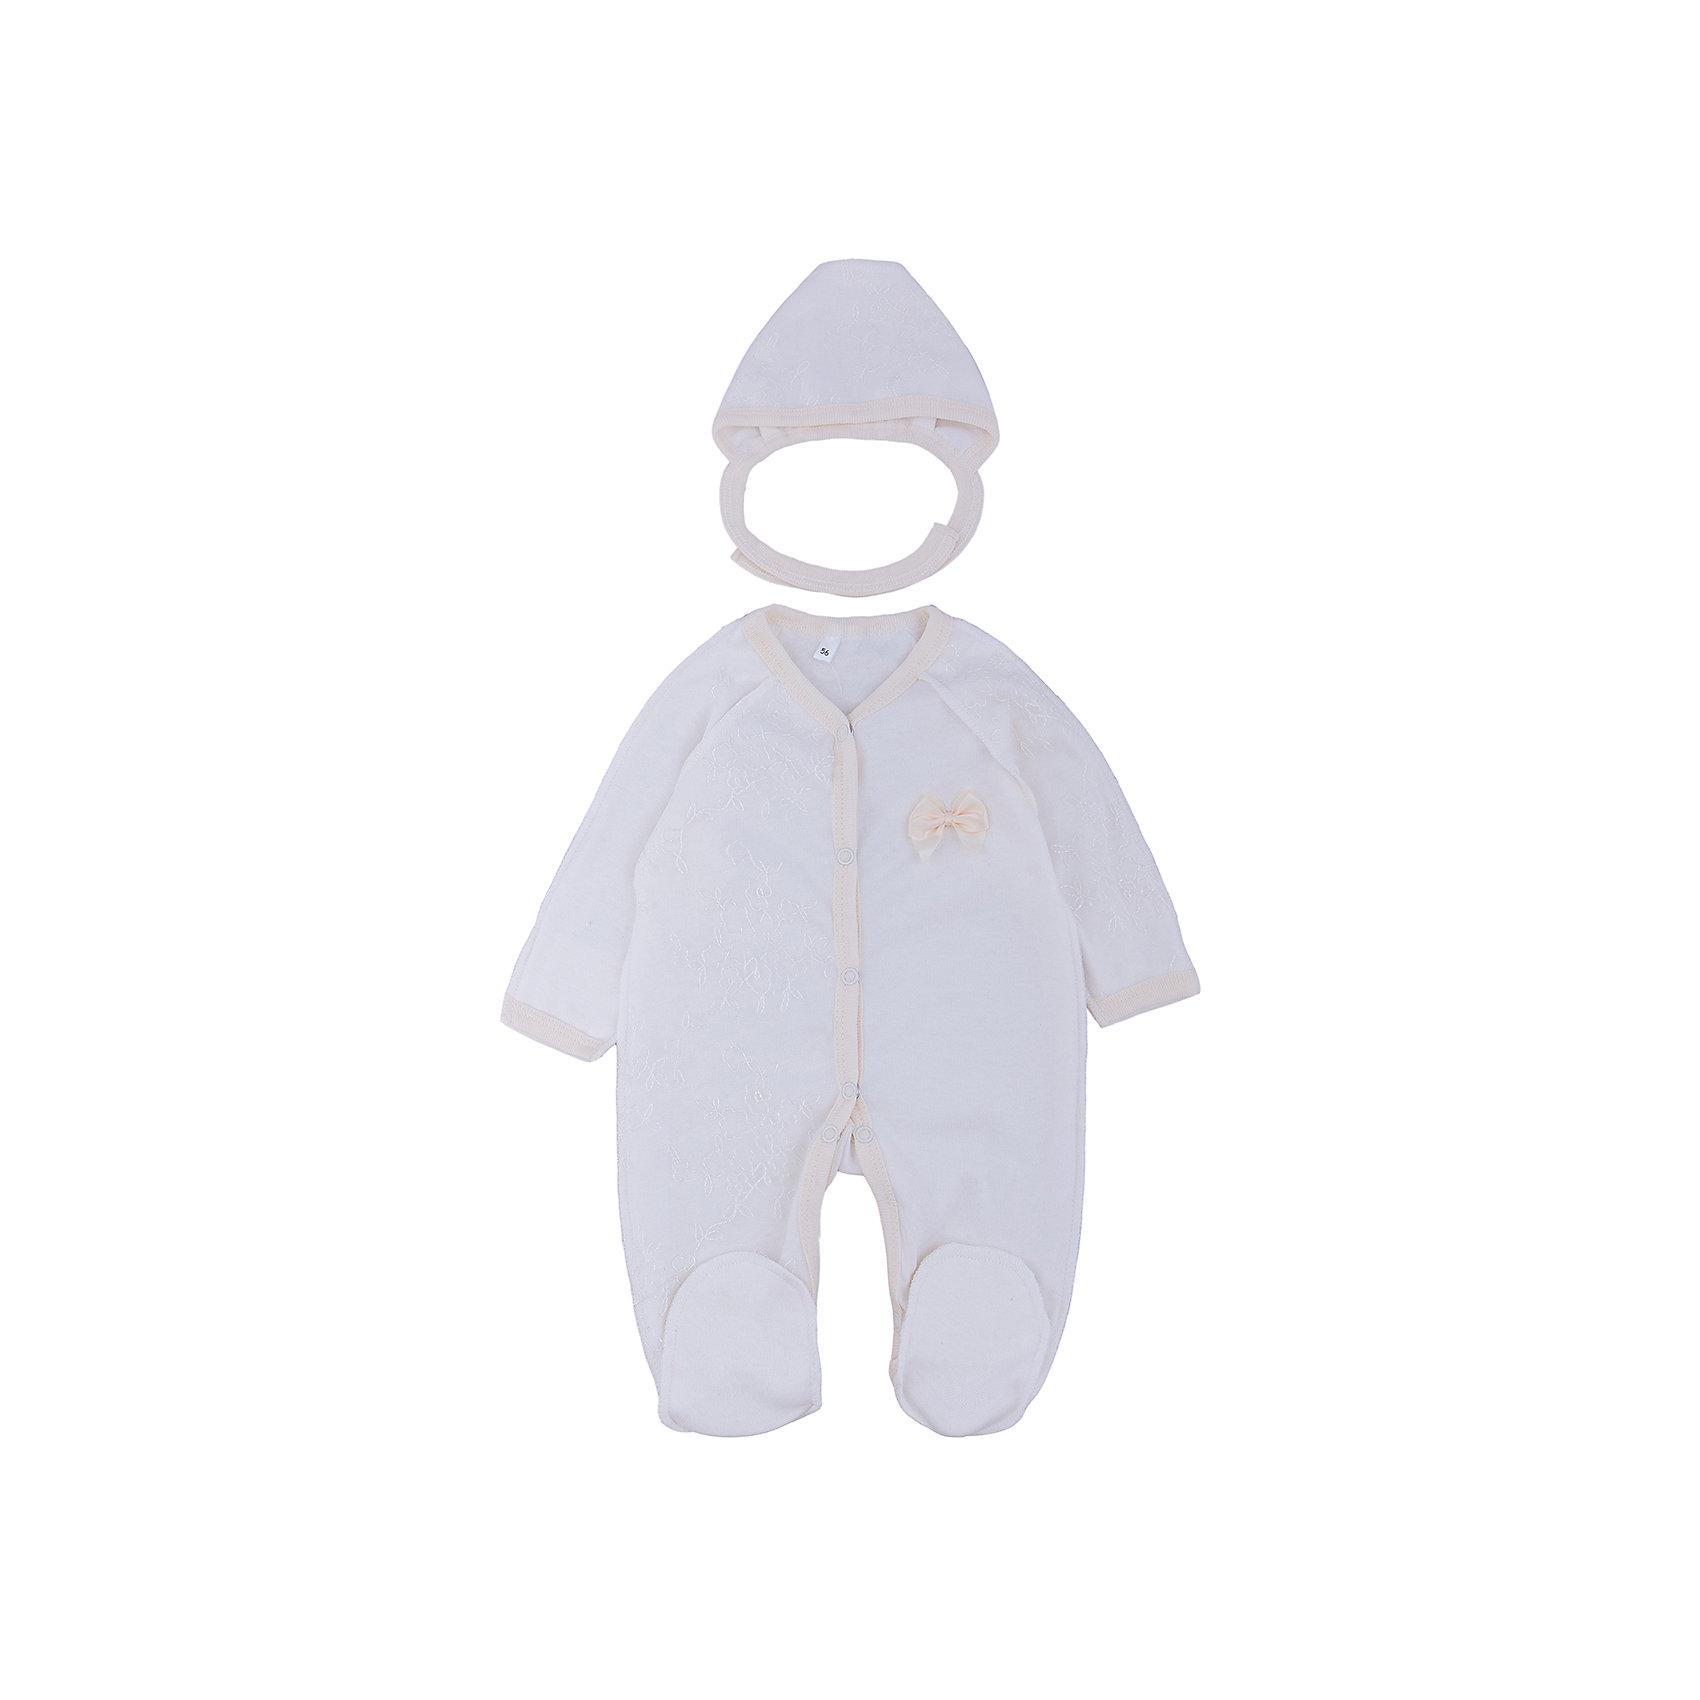 Комплект на выписку  для мальчика Soni kidsНаборы одежды, конверты на выписку<br>Комплект на выписку  для мальчика Soni kids <br>Состав: 100% хлопок<br><br>Ширина мм: 157<br>Глубина мм: 13<br>Высота мм: 119<br>Вес г: 200<br>Цвет: разноцветный<br>Возраст от месяцев: 0<br>Возраст до месяцев: 3<br>Пол: Мужской<br>Возраст: Детский<br>Размер: 56<br>SKU: 4944796